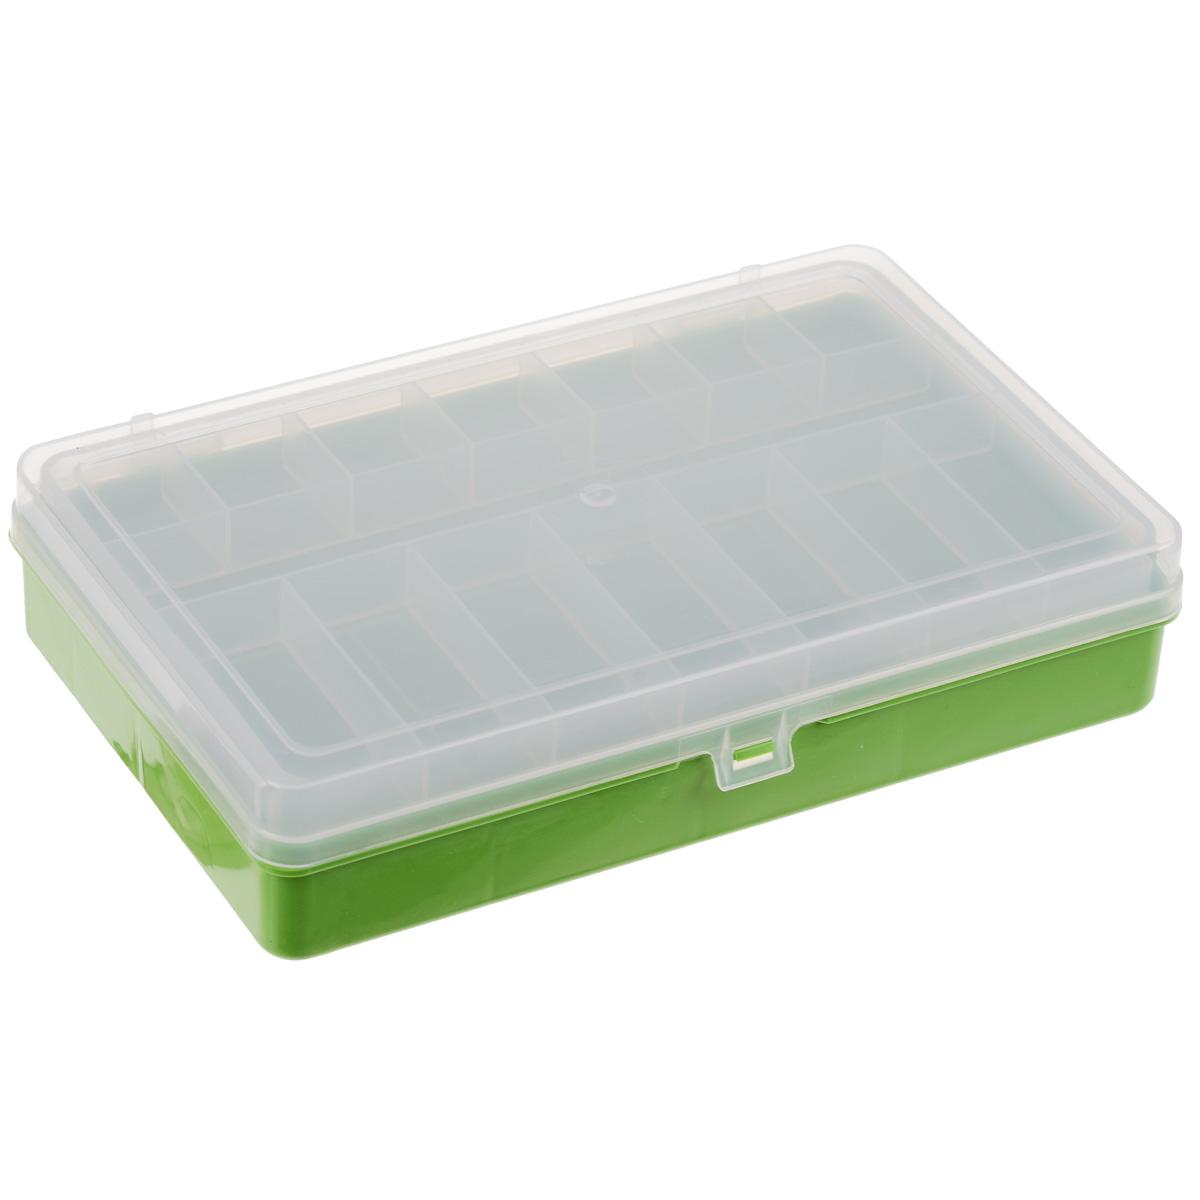 Органайзер для мелочей, 2-х ярусный, 3 тип, 23,5 см х 14,5 см х 5 см, цвет: зеленый, прозрачный